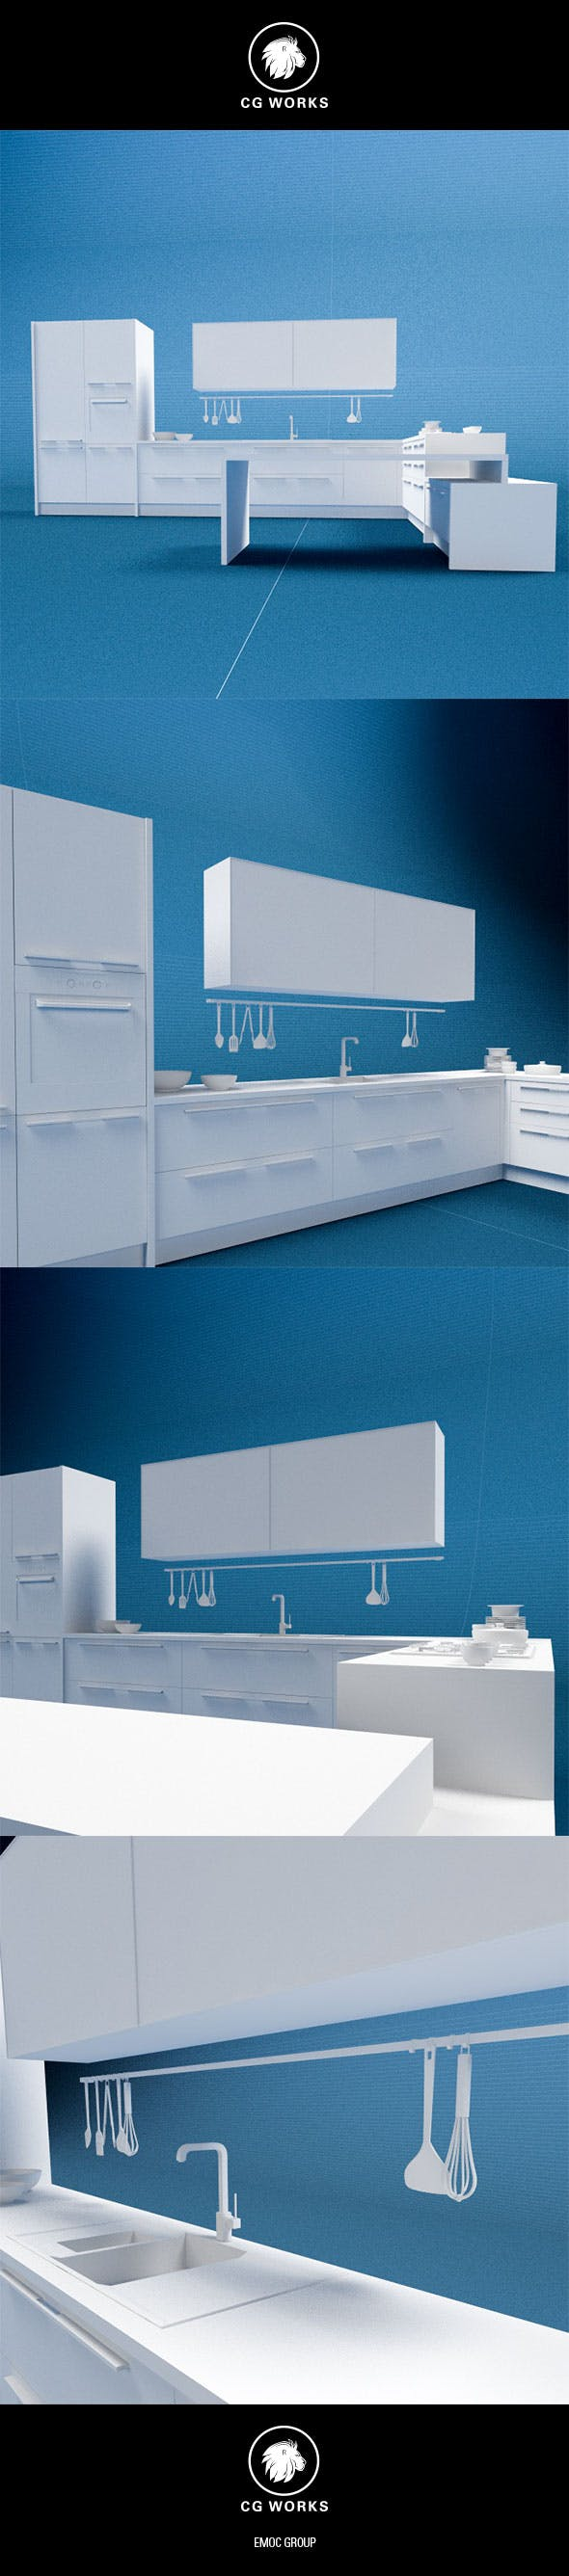 Kitchen C4D & OBJ - 3DOcean Item for Sale